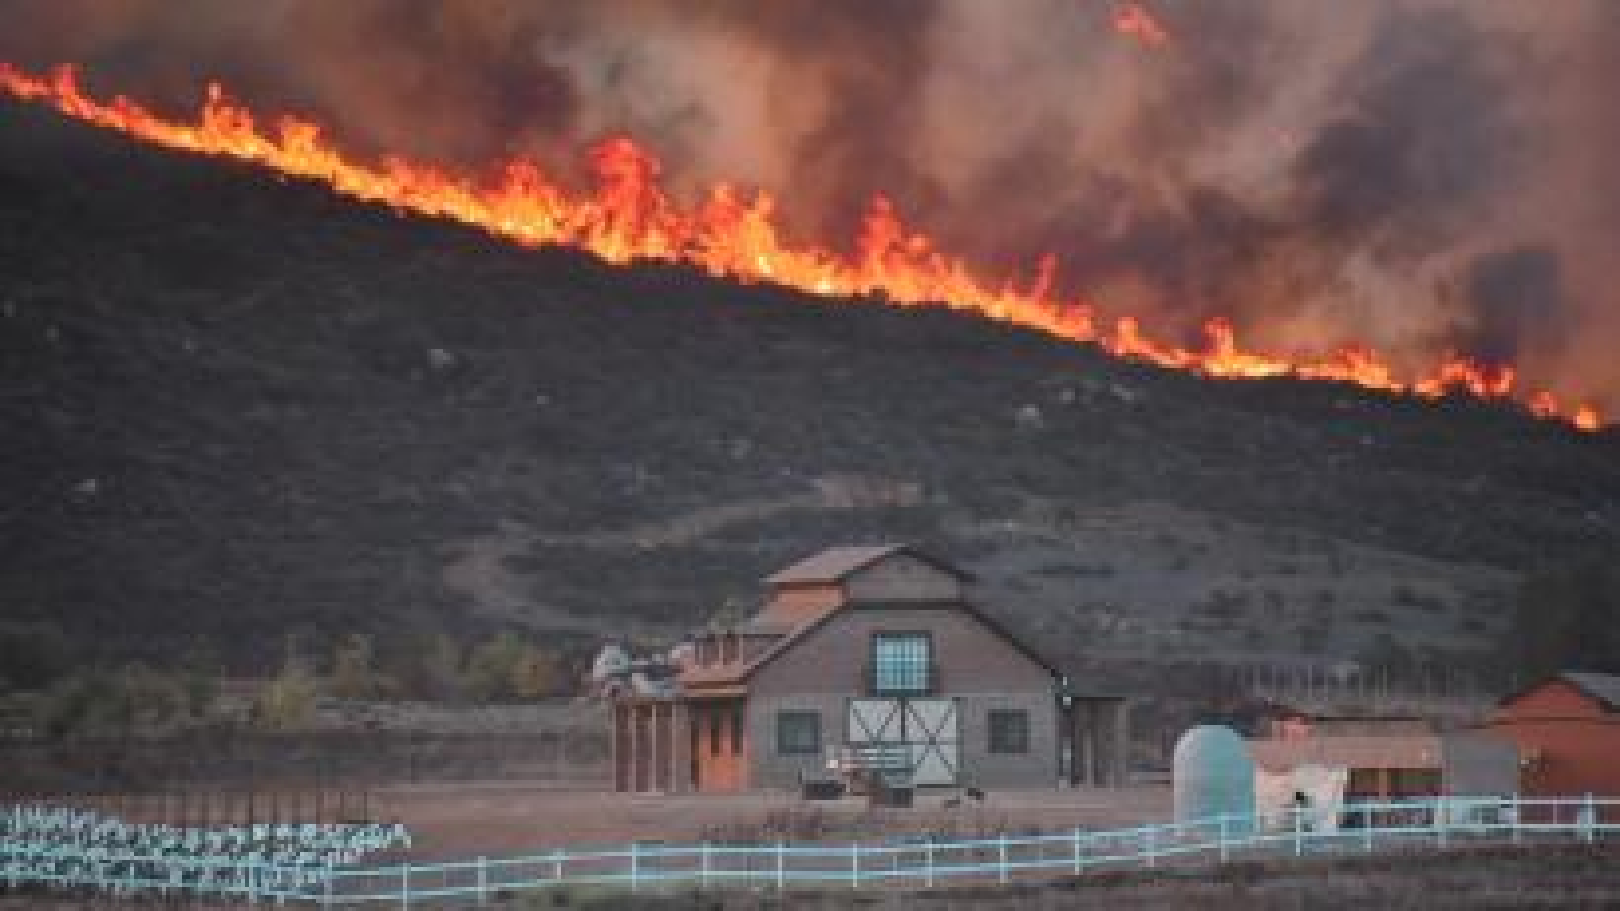 A fire burns in Valle De Guadalupe, Baja California